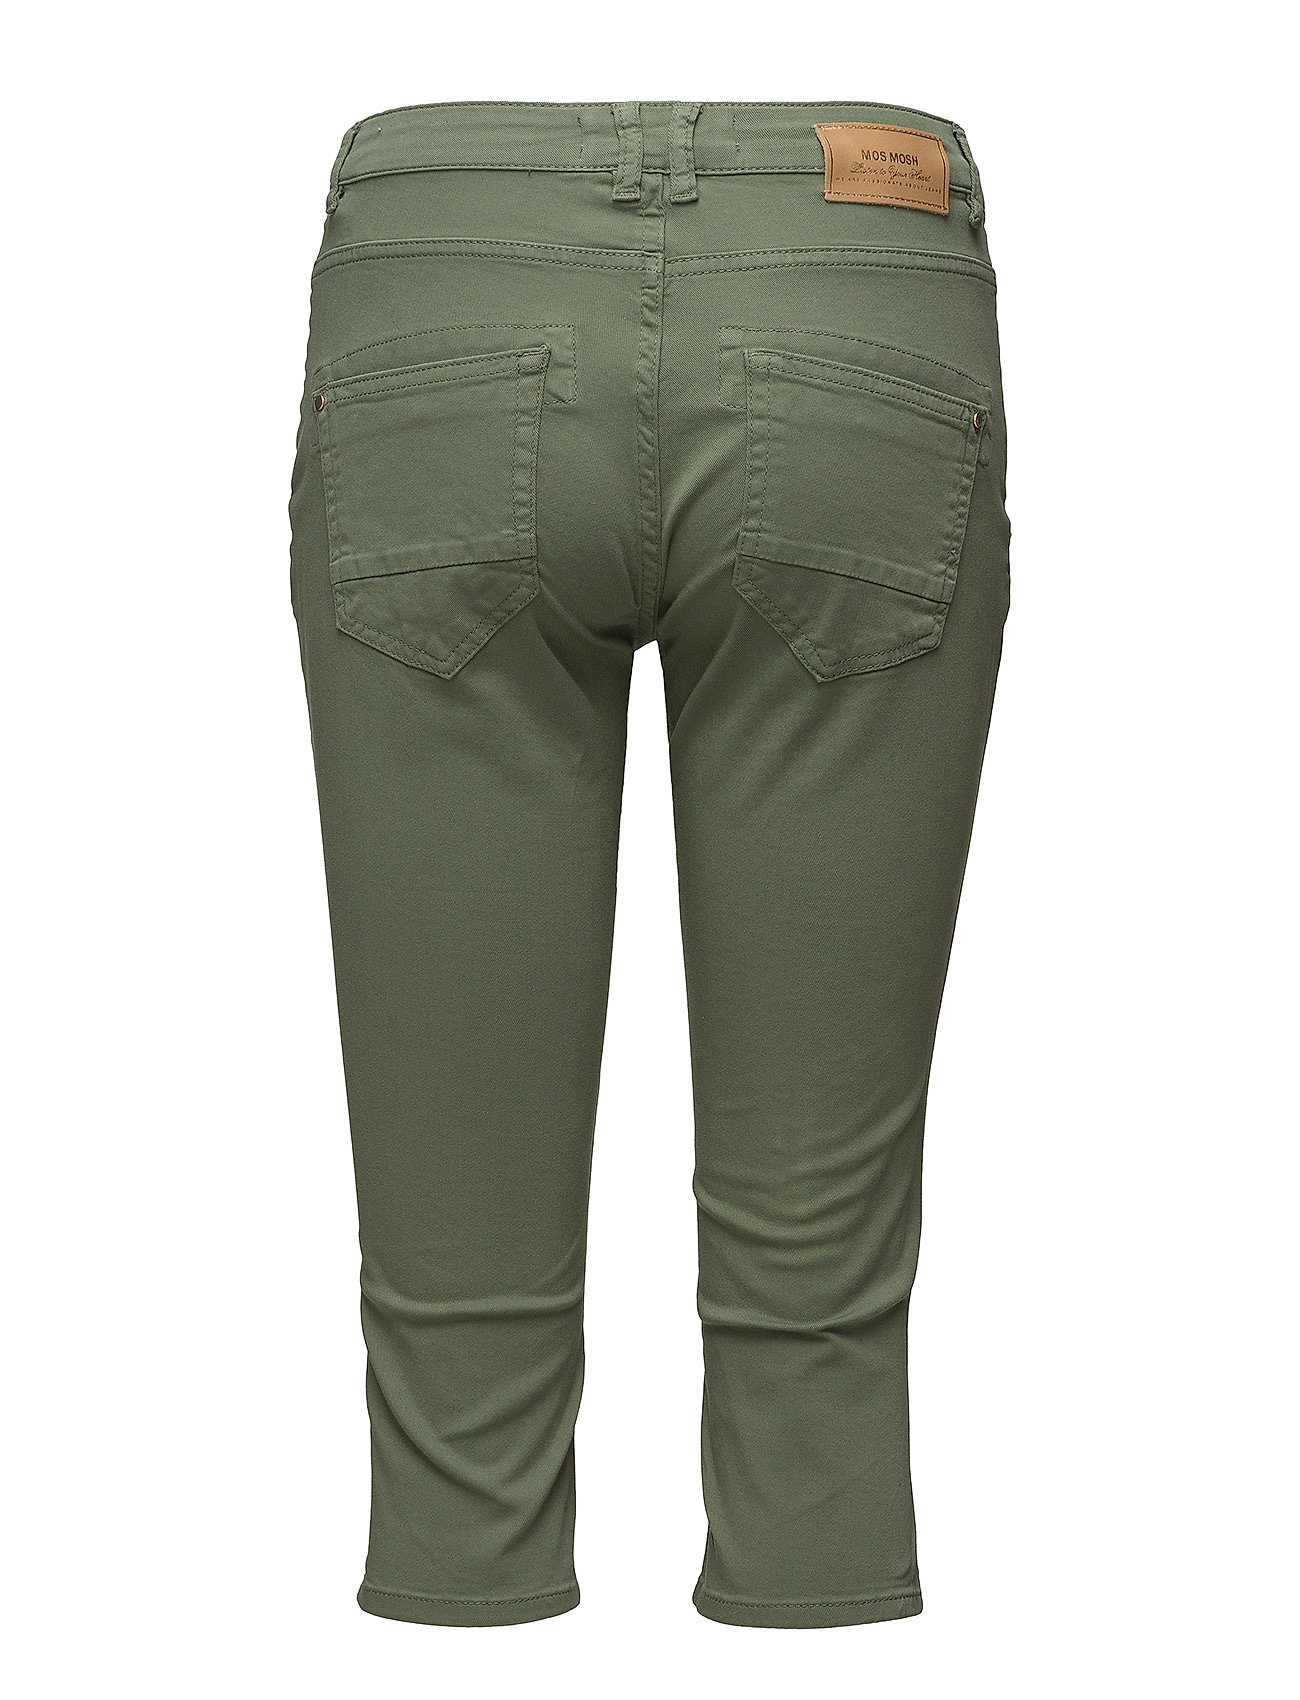 e0bbe5da MOS MOSH slim fit bukser – Etta Colour 3/4 til dame i Camouflage ...